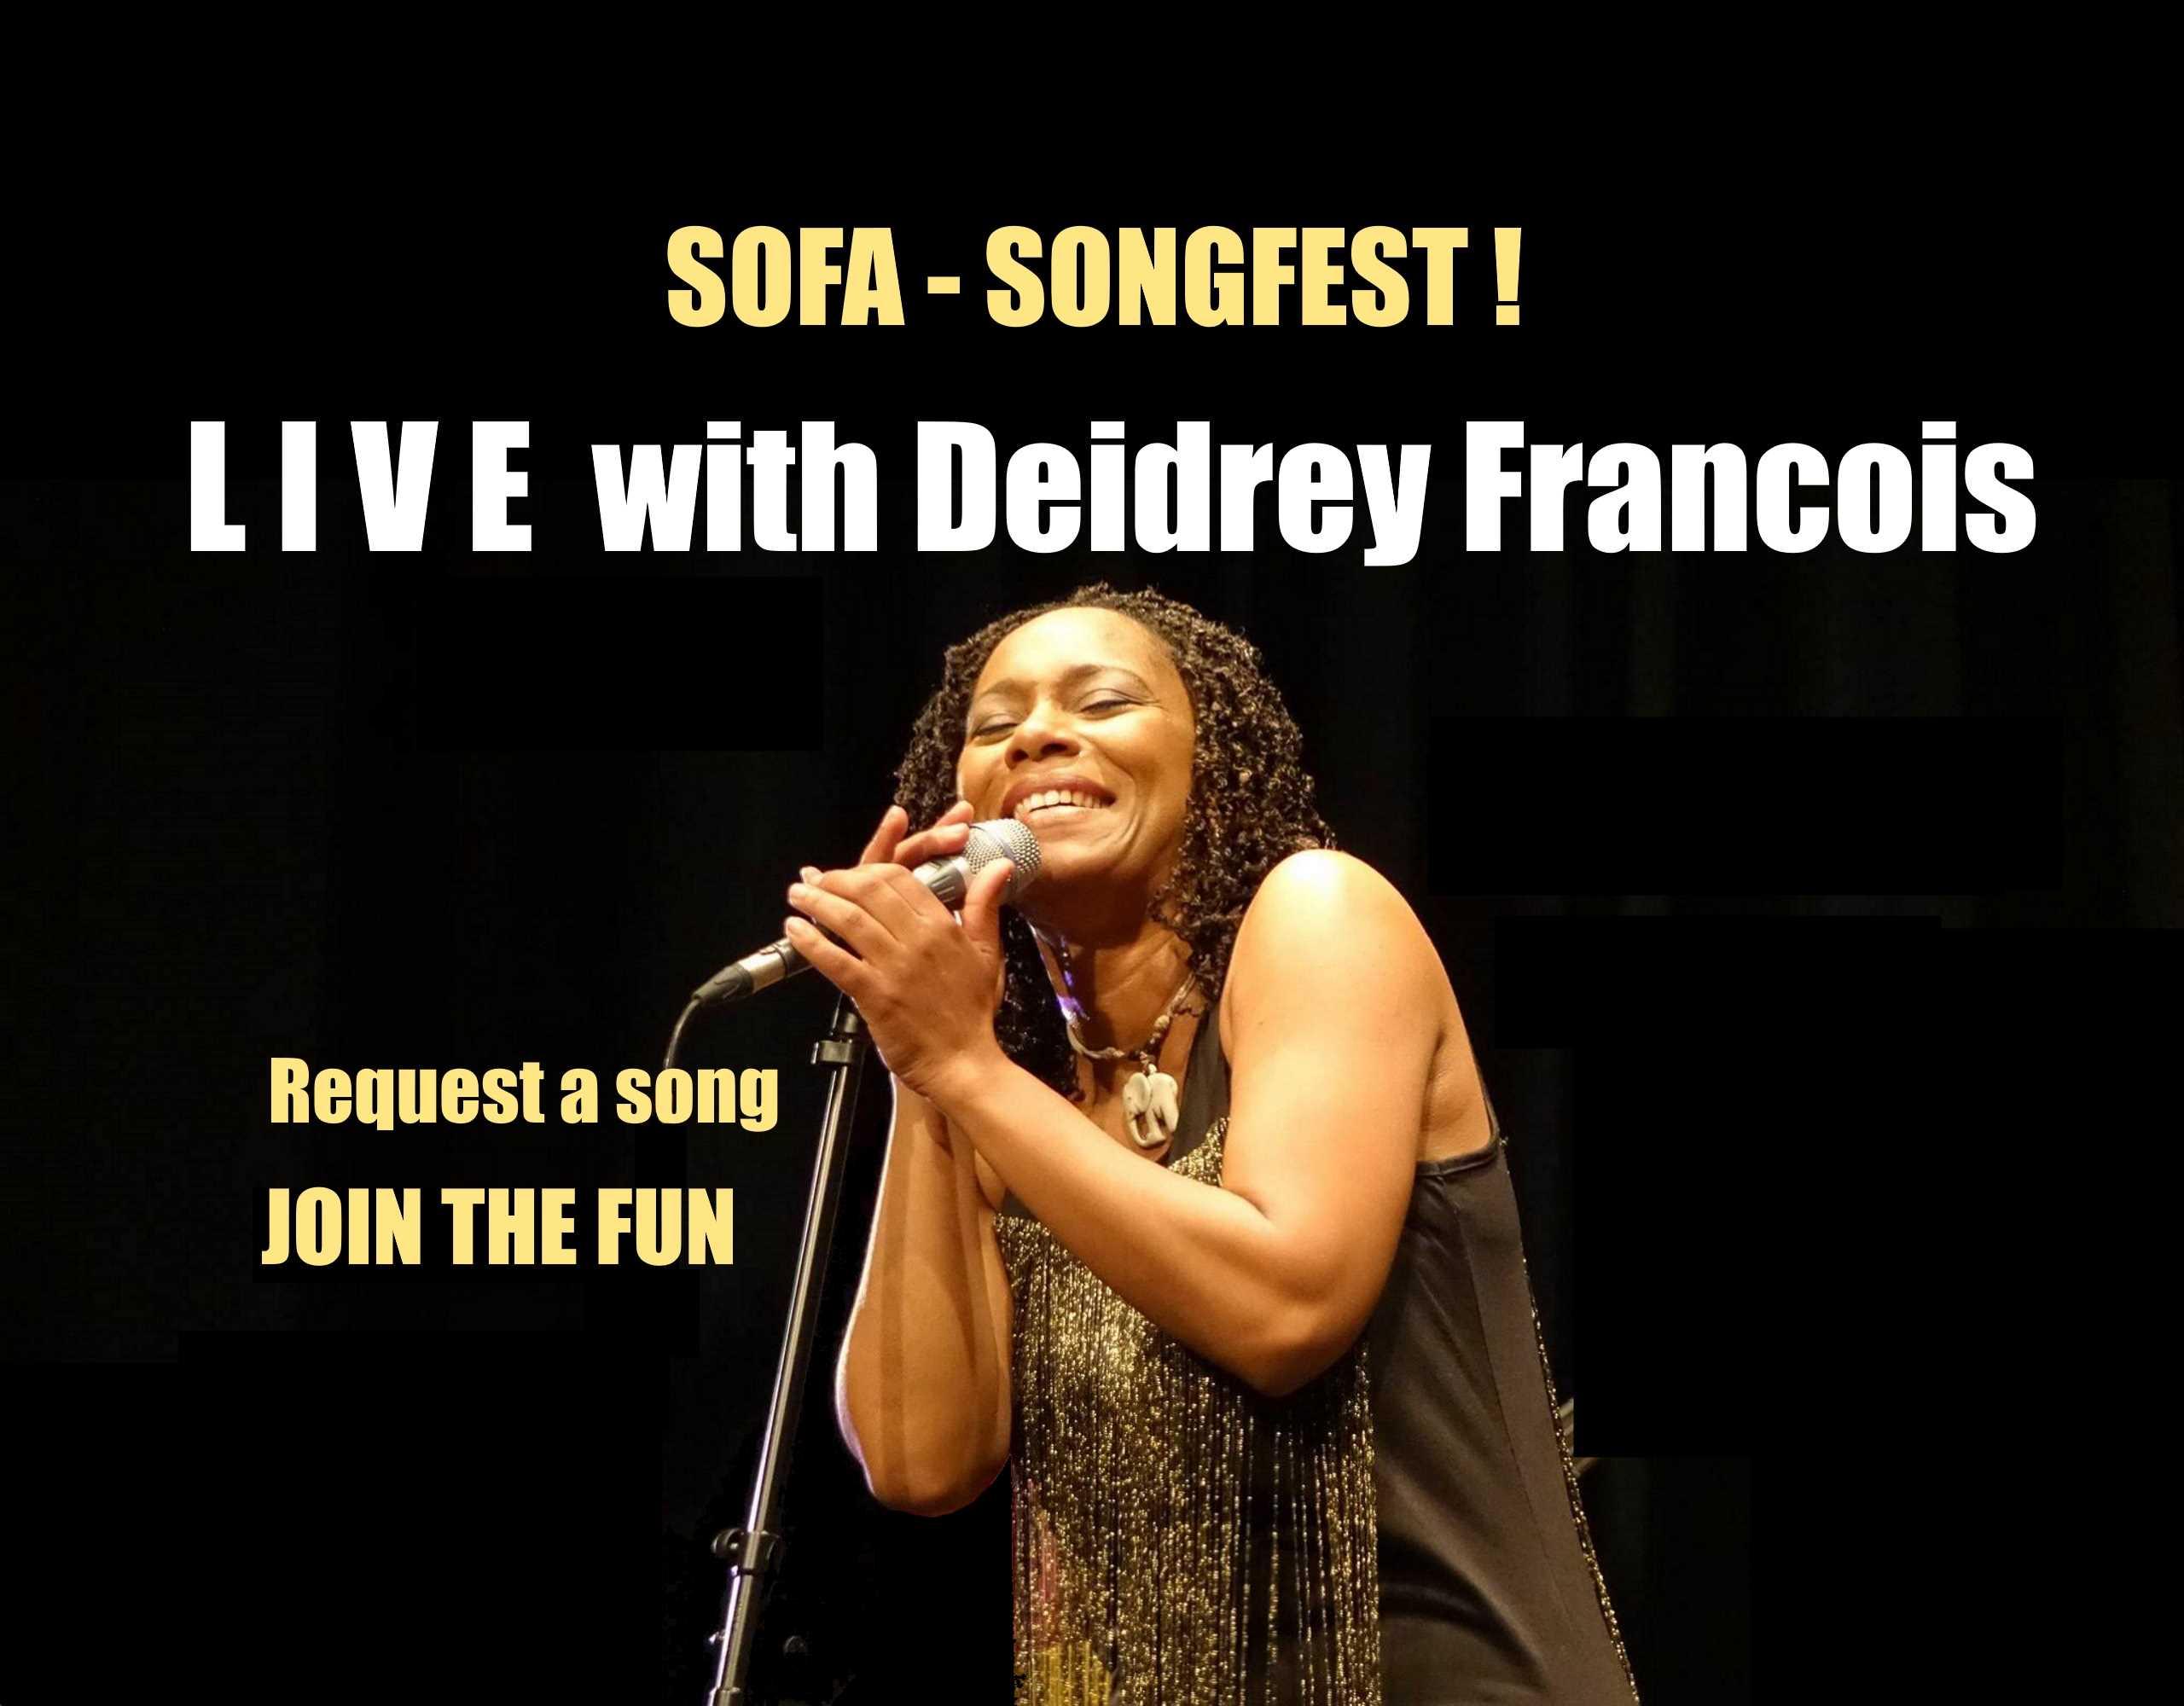 Sofa Songfest - Live with Deidrey Francois